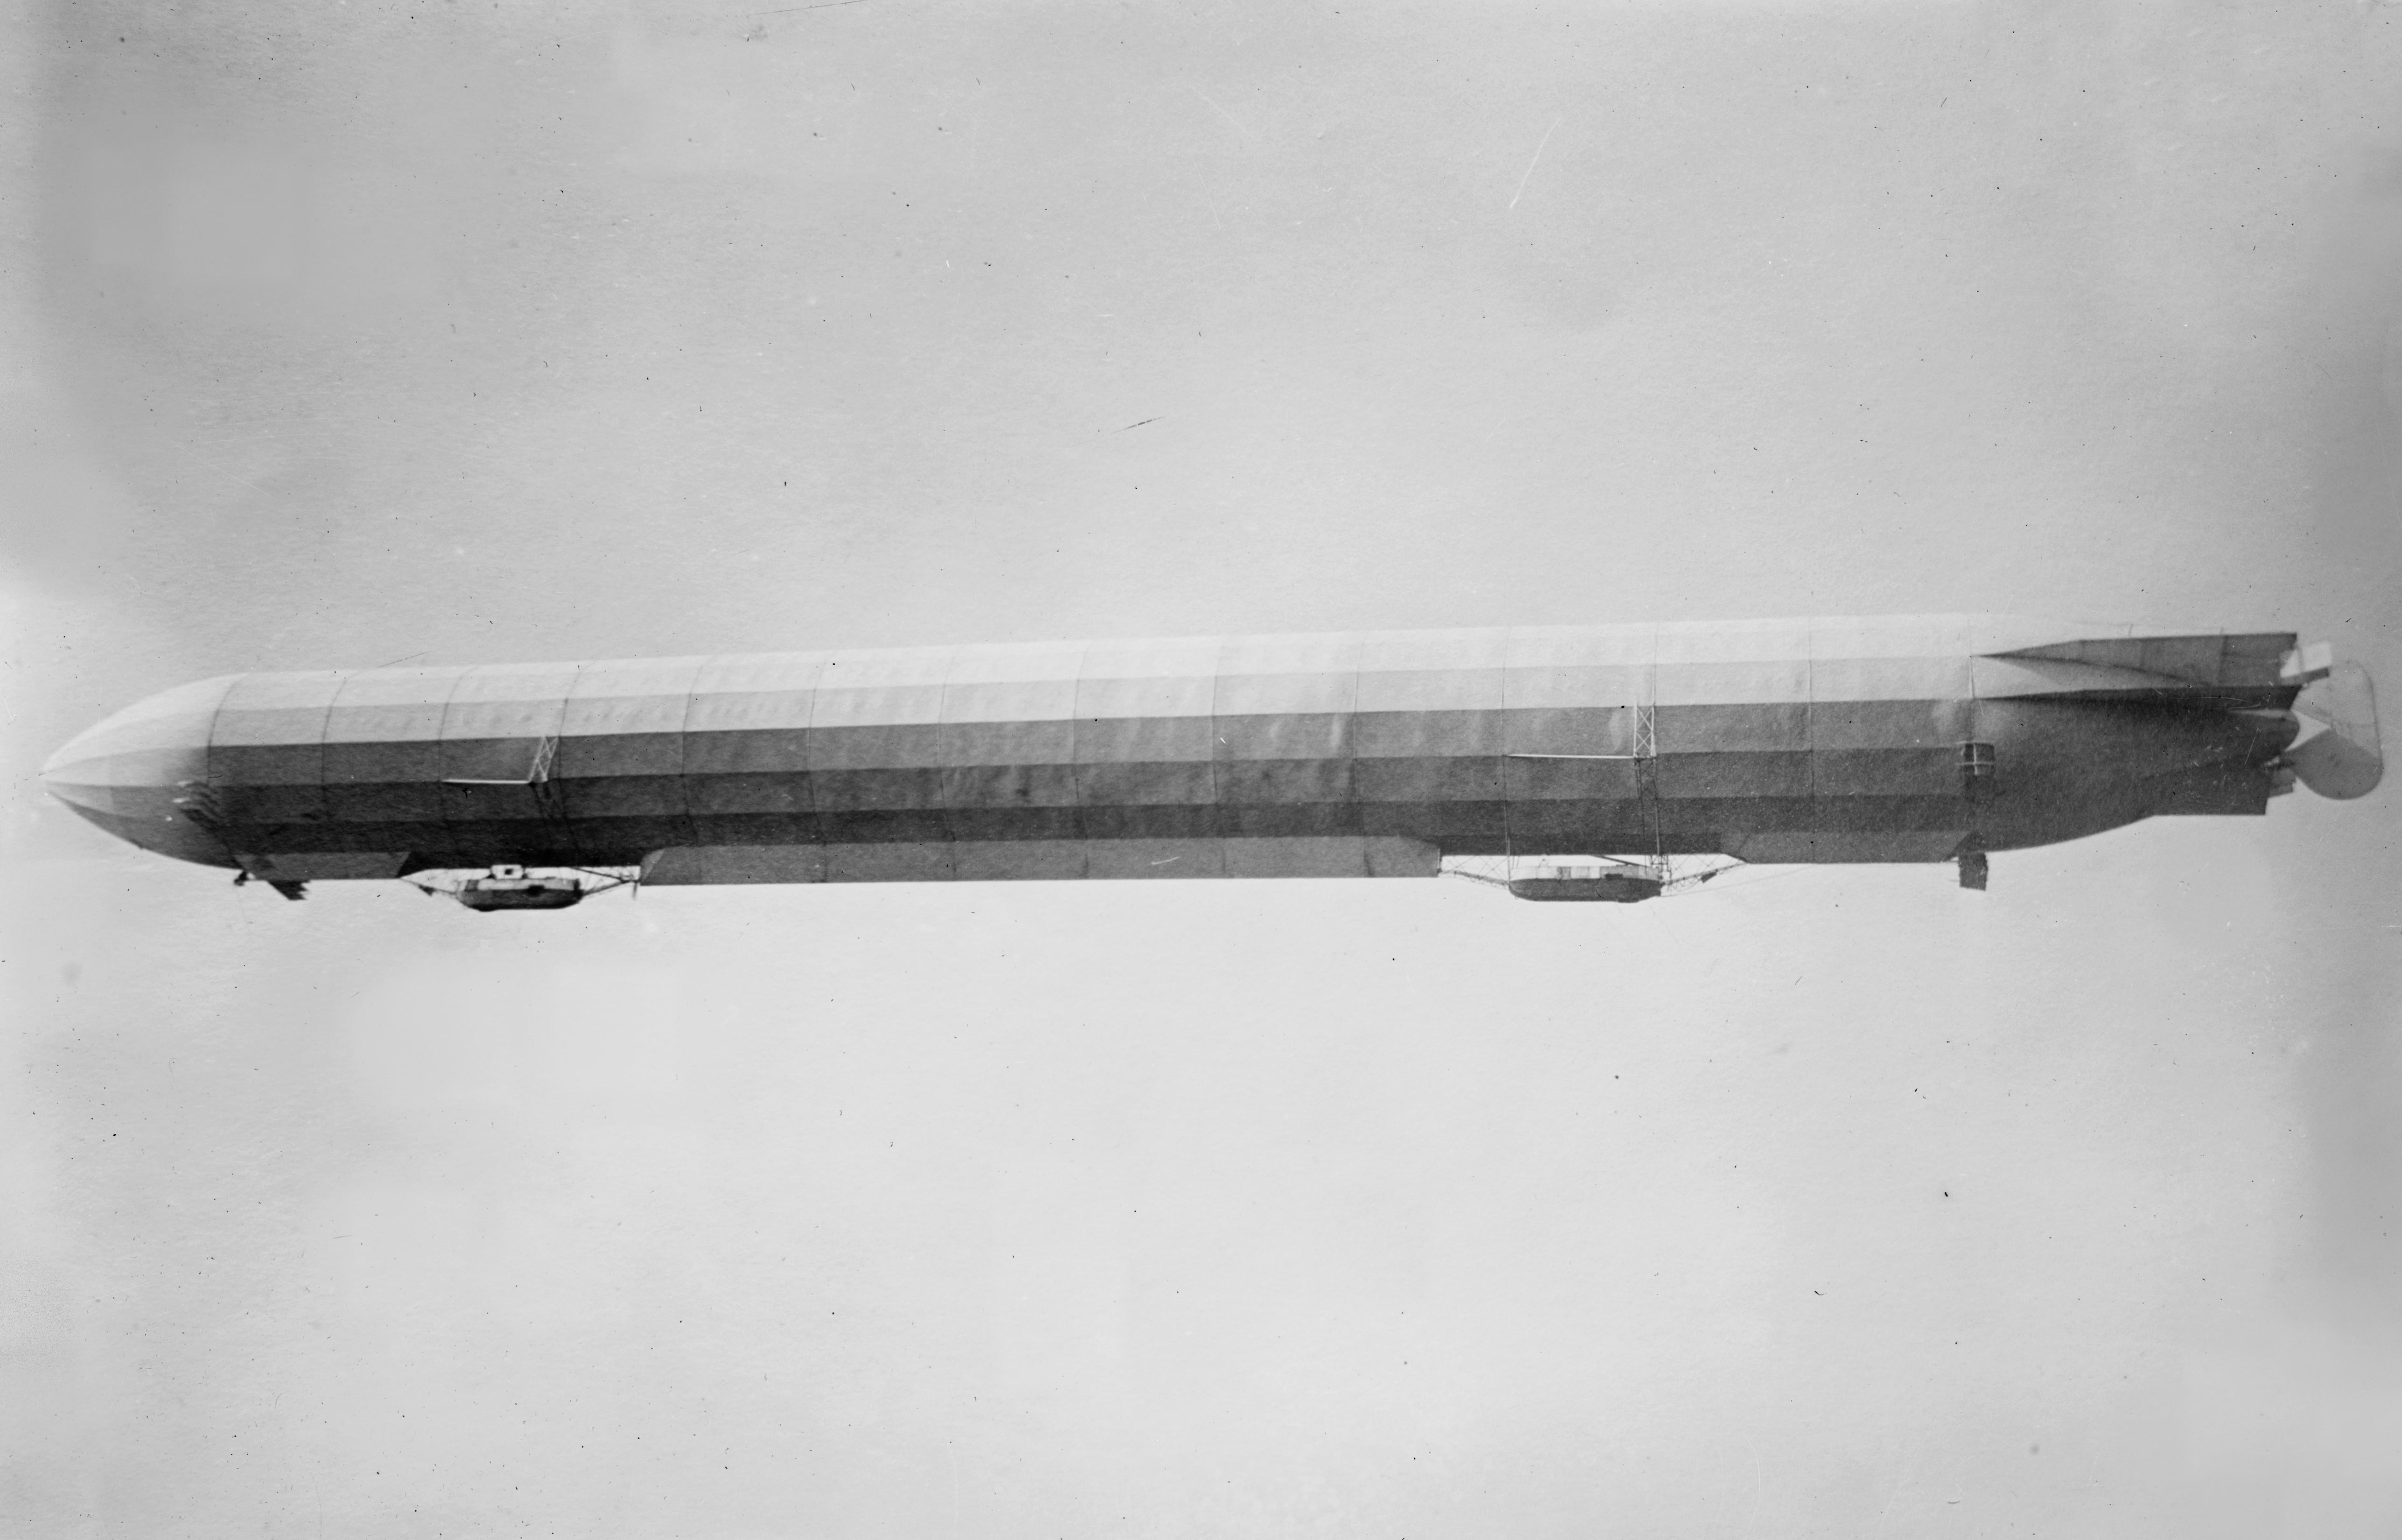 Zeppelin_III_in_flight